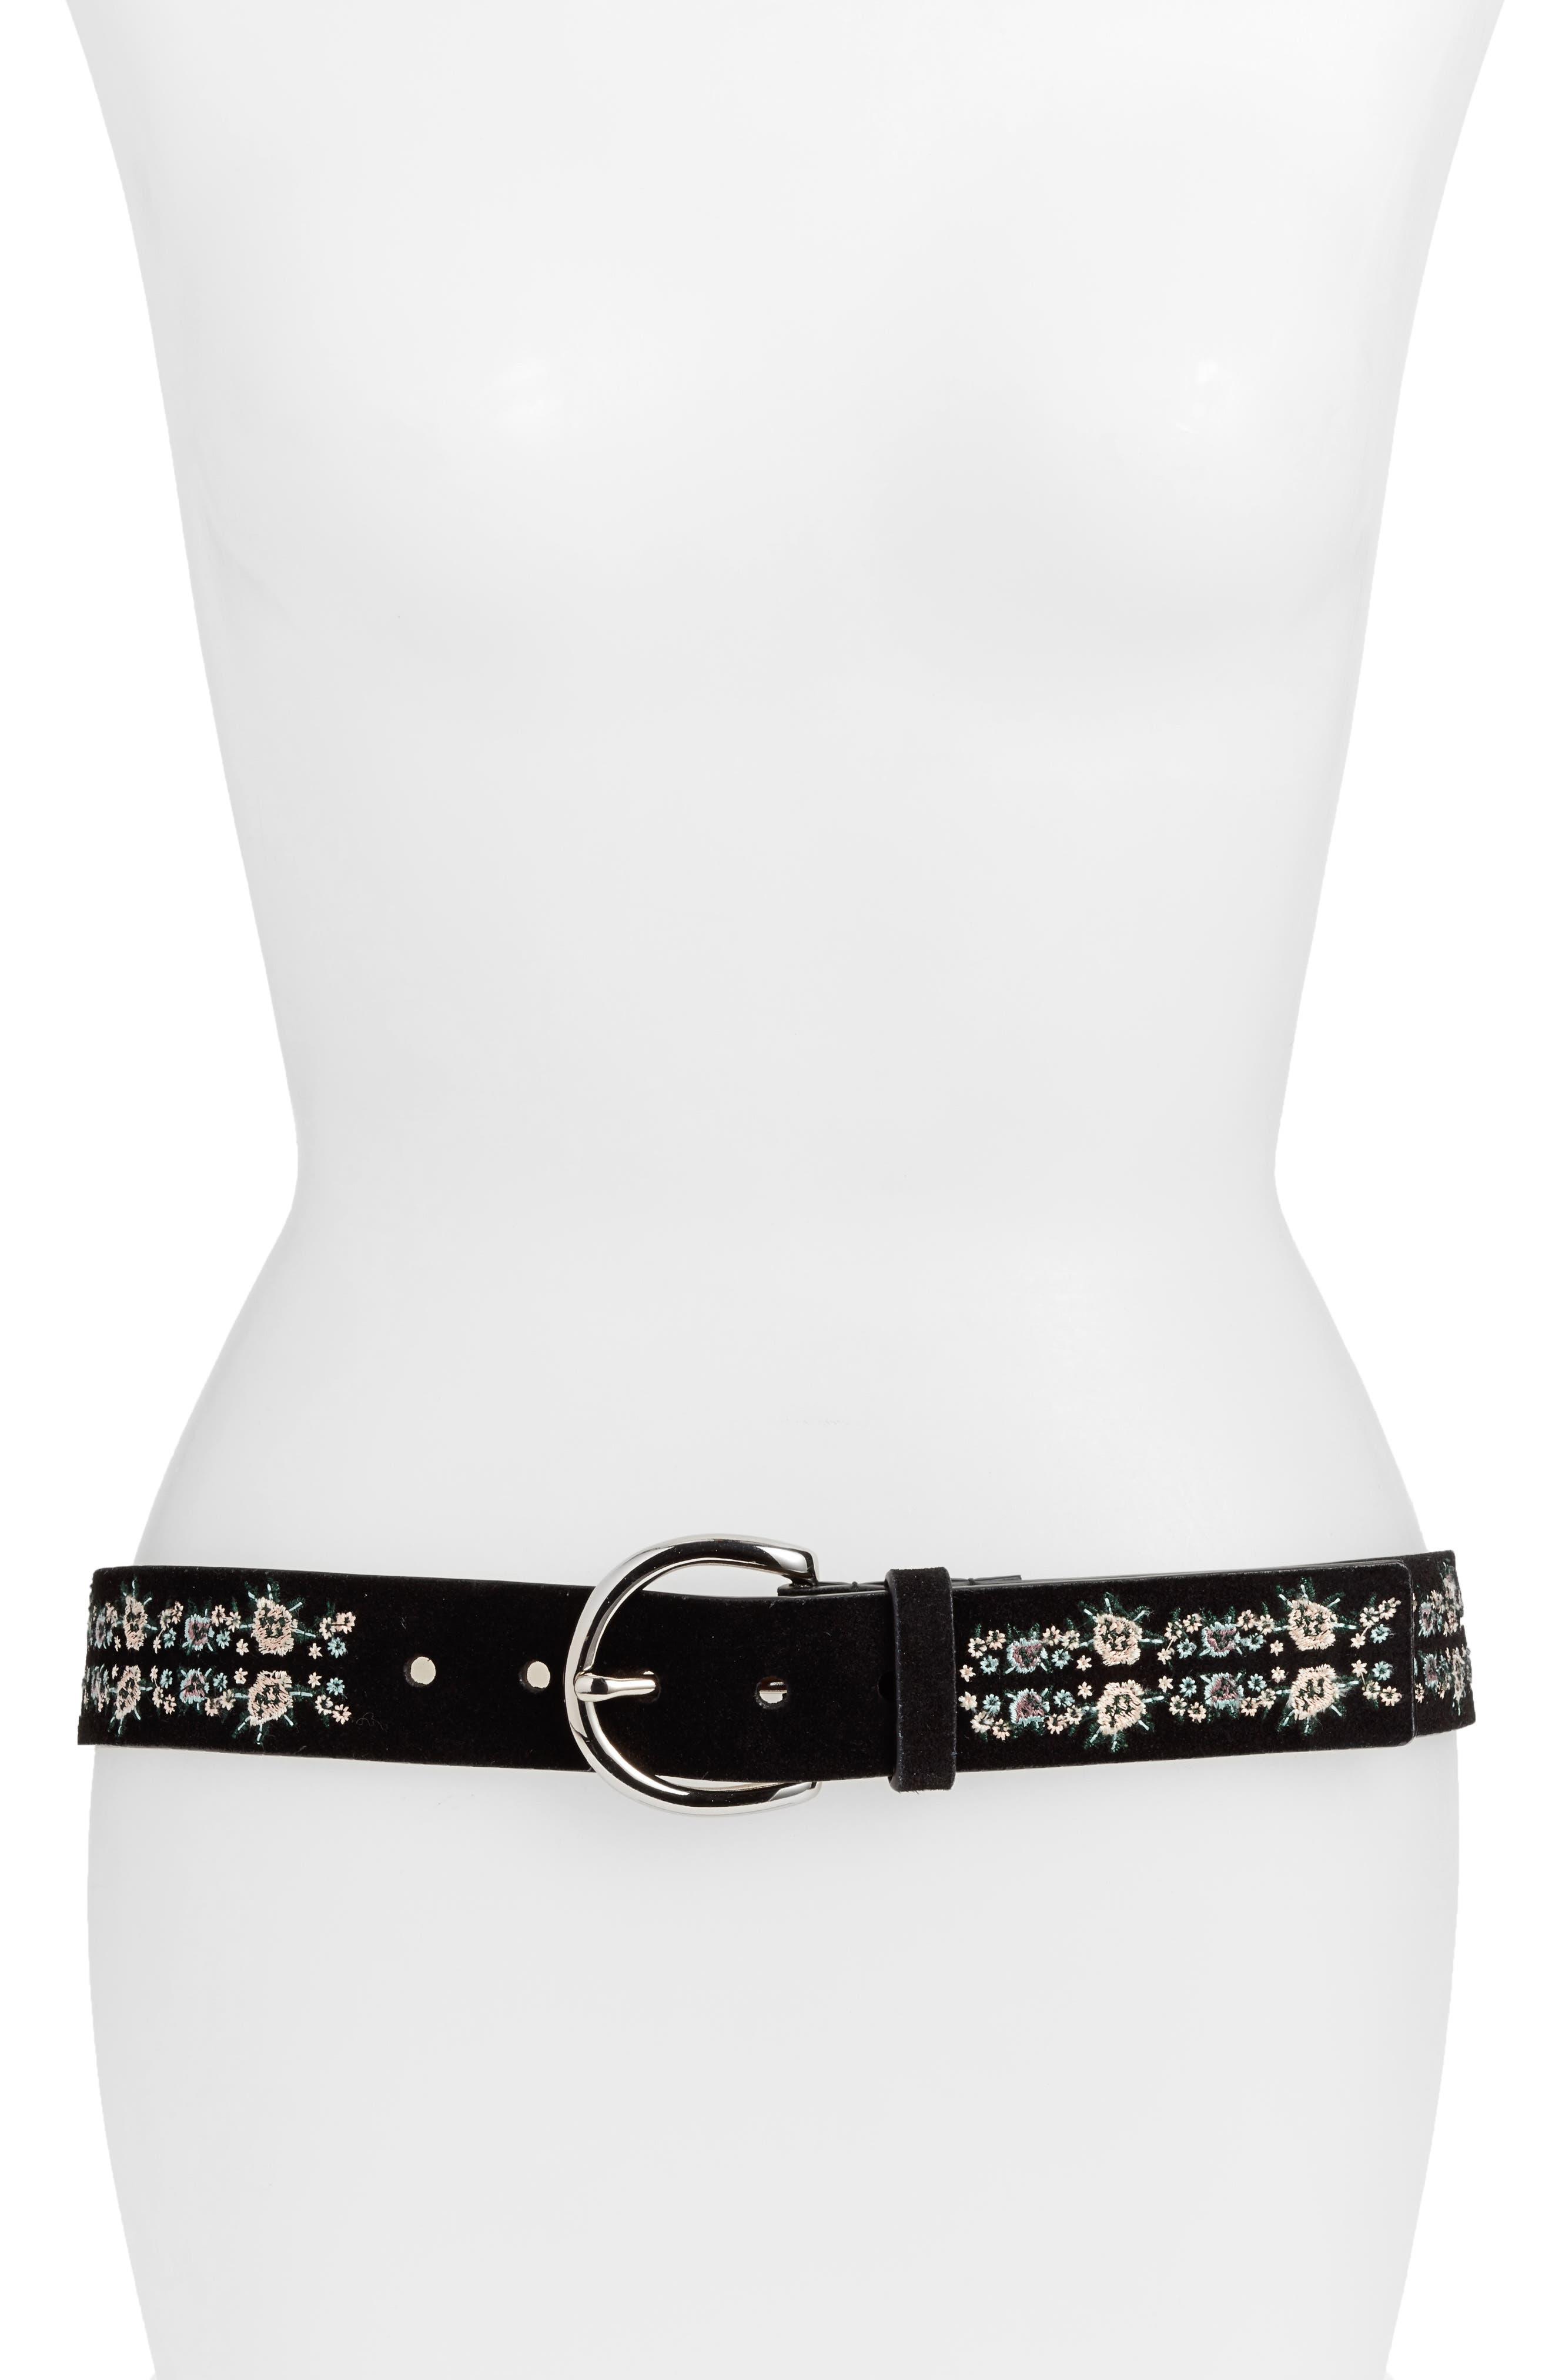 Rebecca Minkoff Selena Embroidered Leather Belt